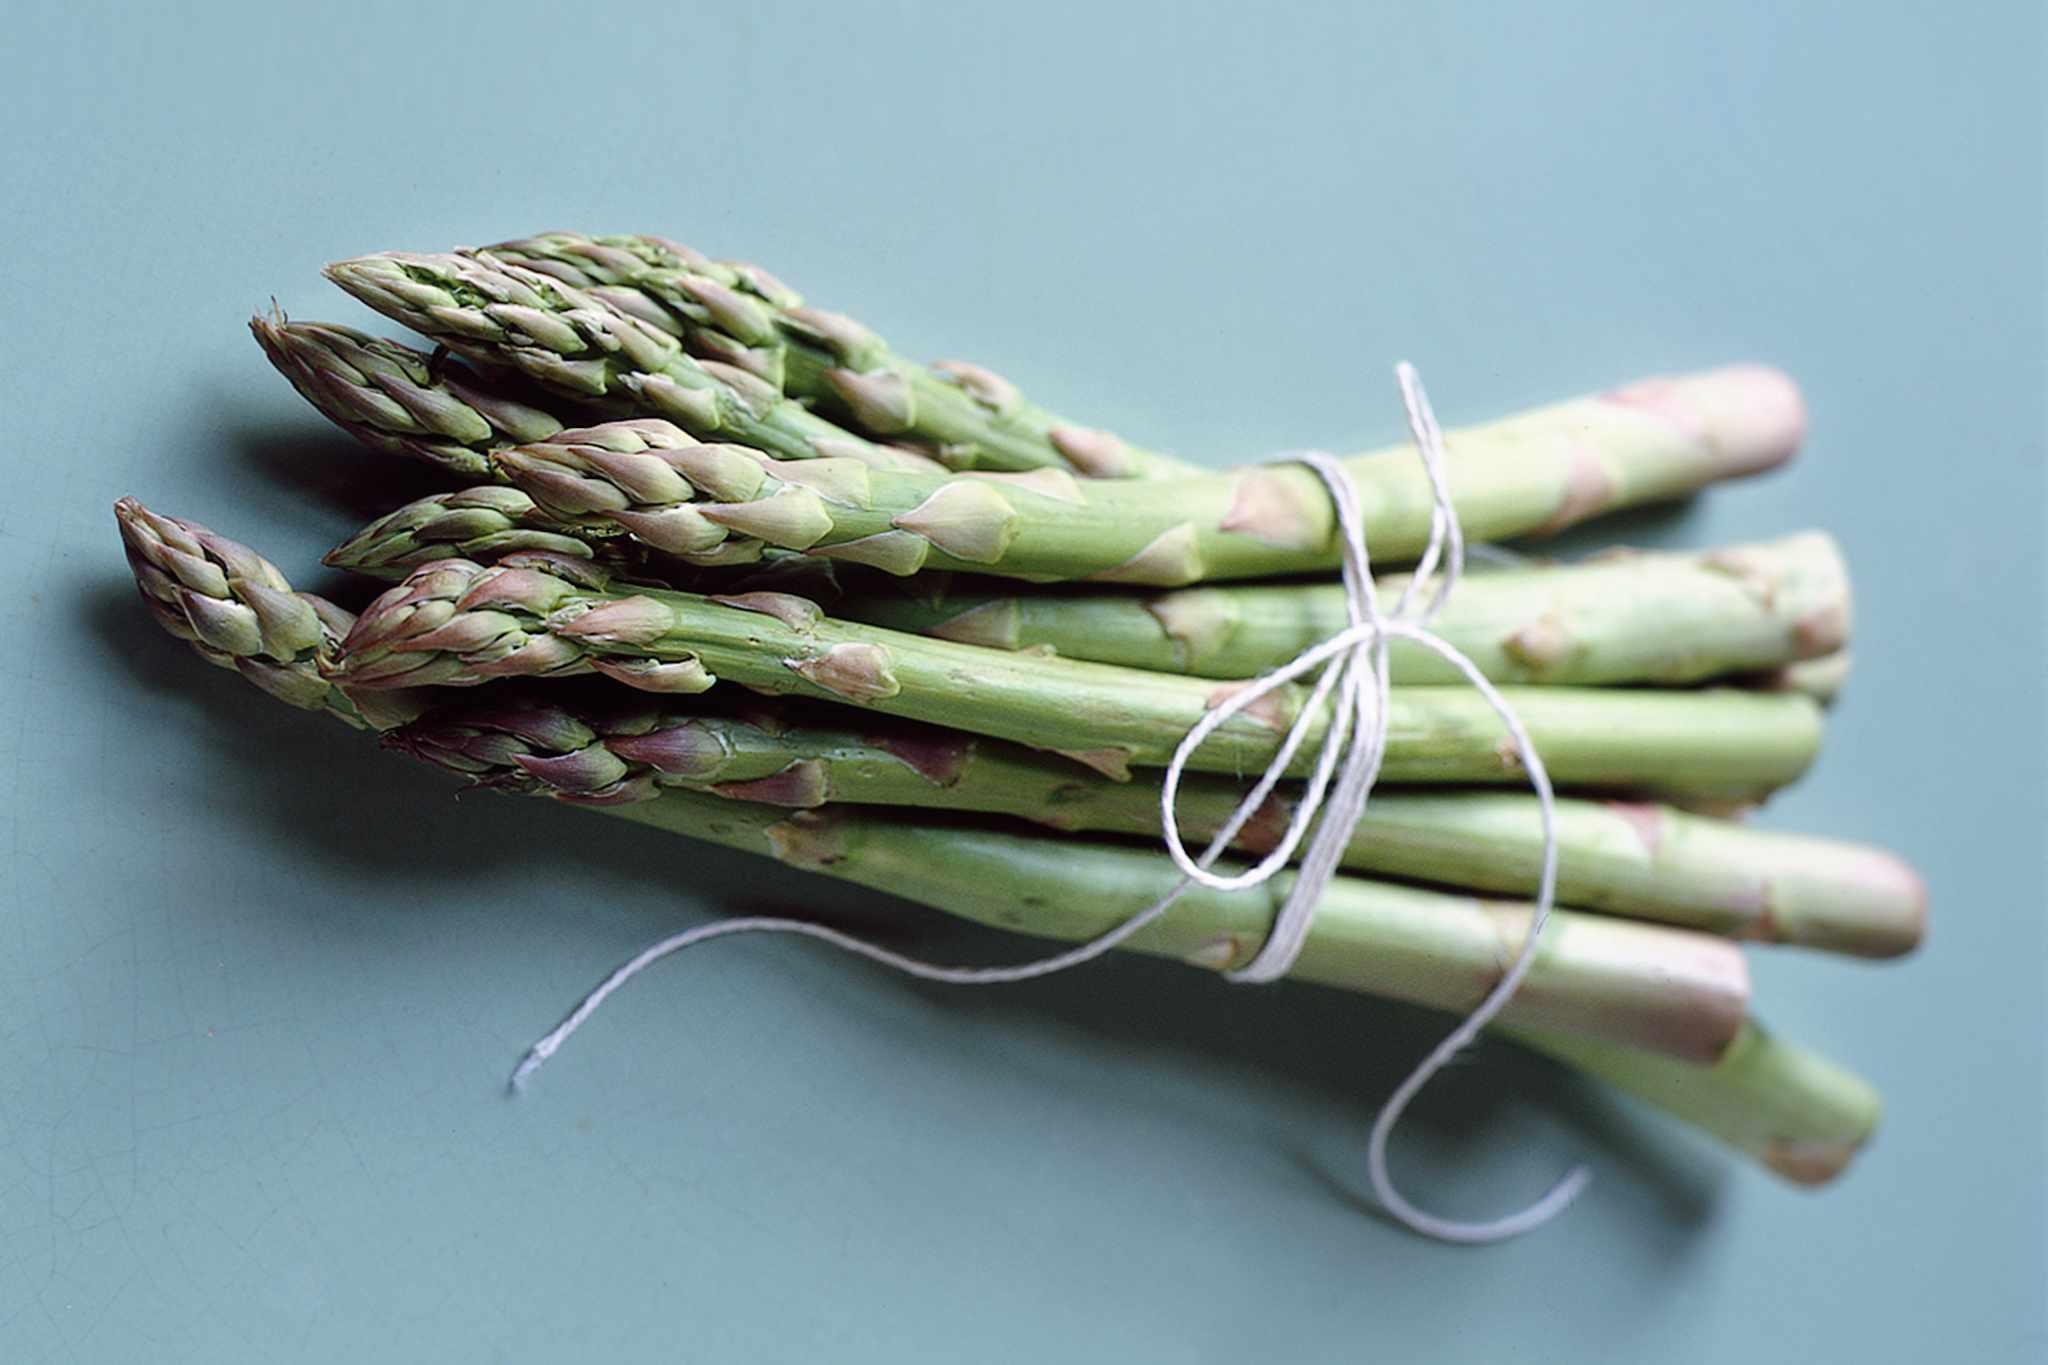 Asparagus. Photo by Simon Walton, courtesy of BBC Good Food Magazine and www.bbcgoodfood.com